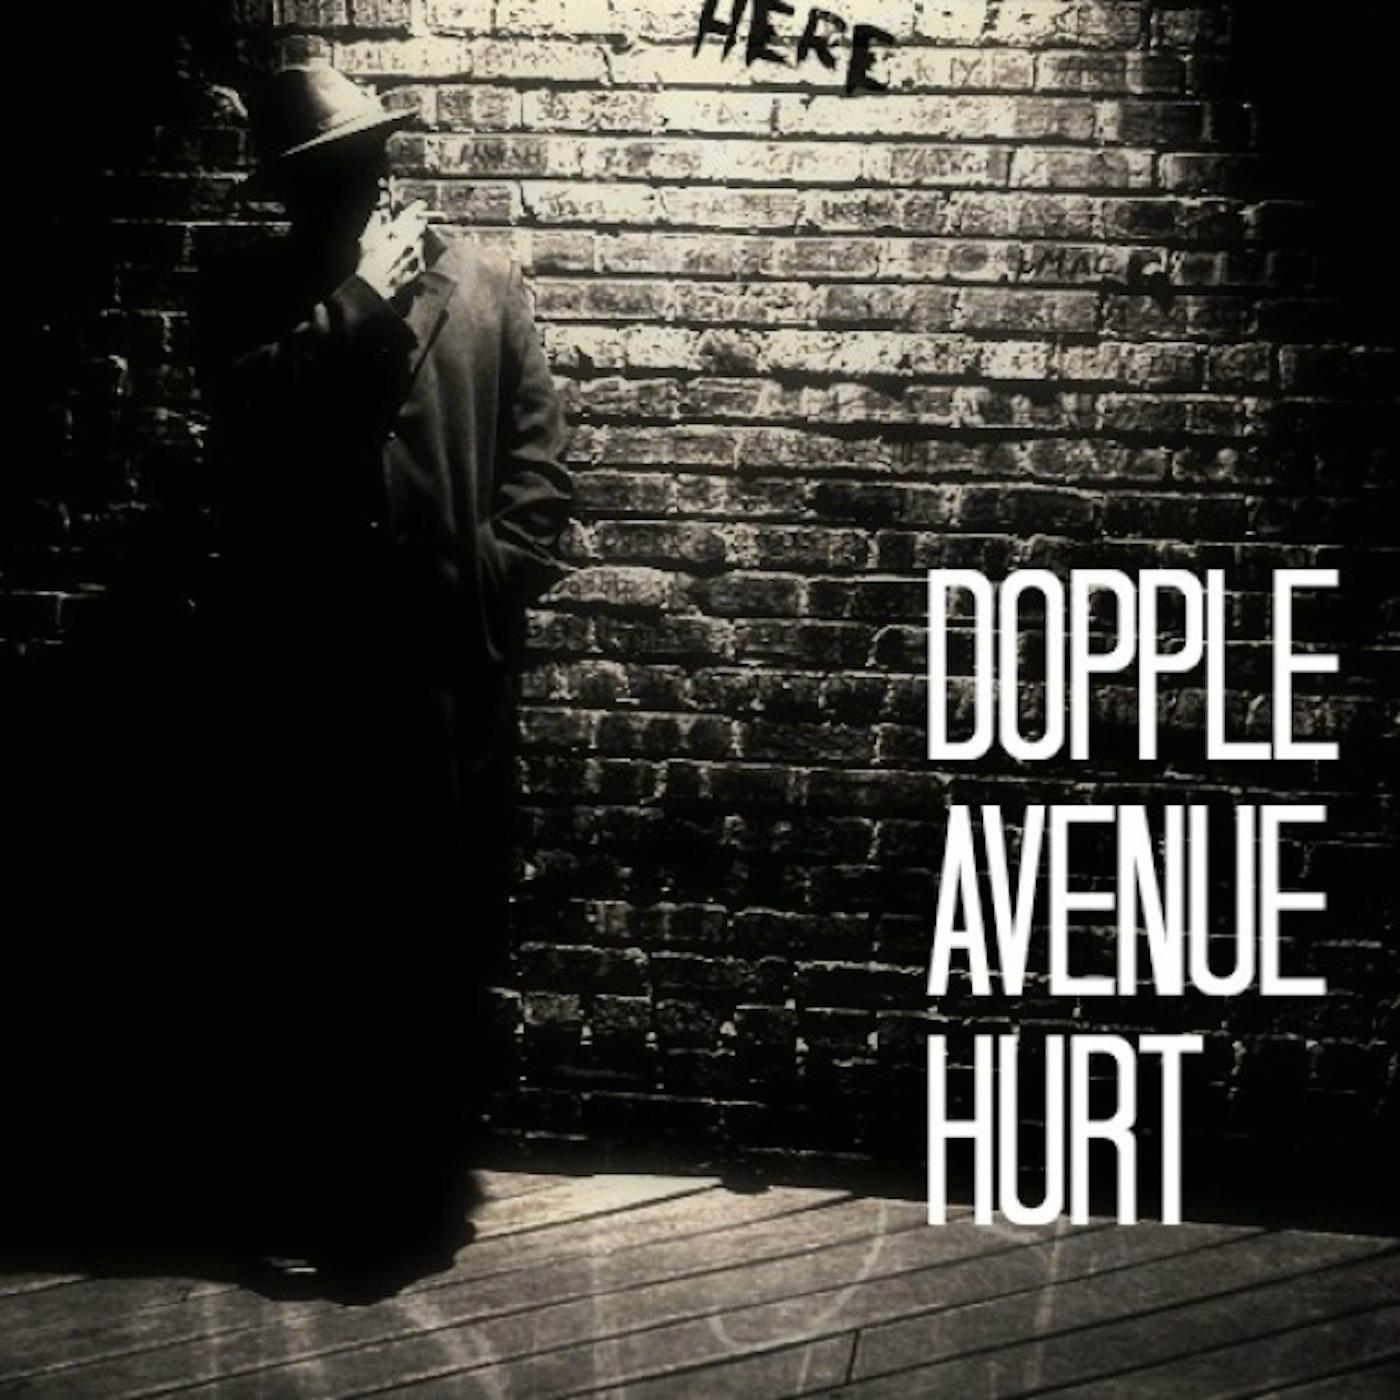 Dopple Avenue Hurt